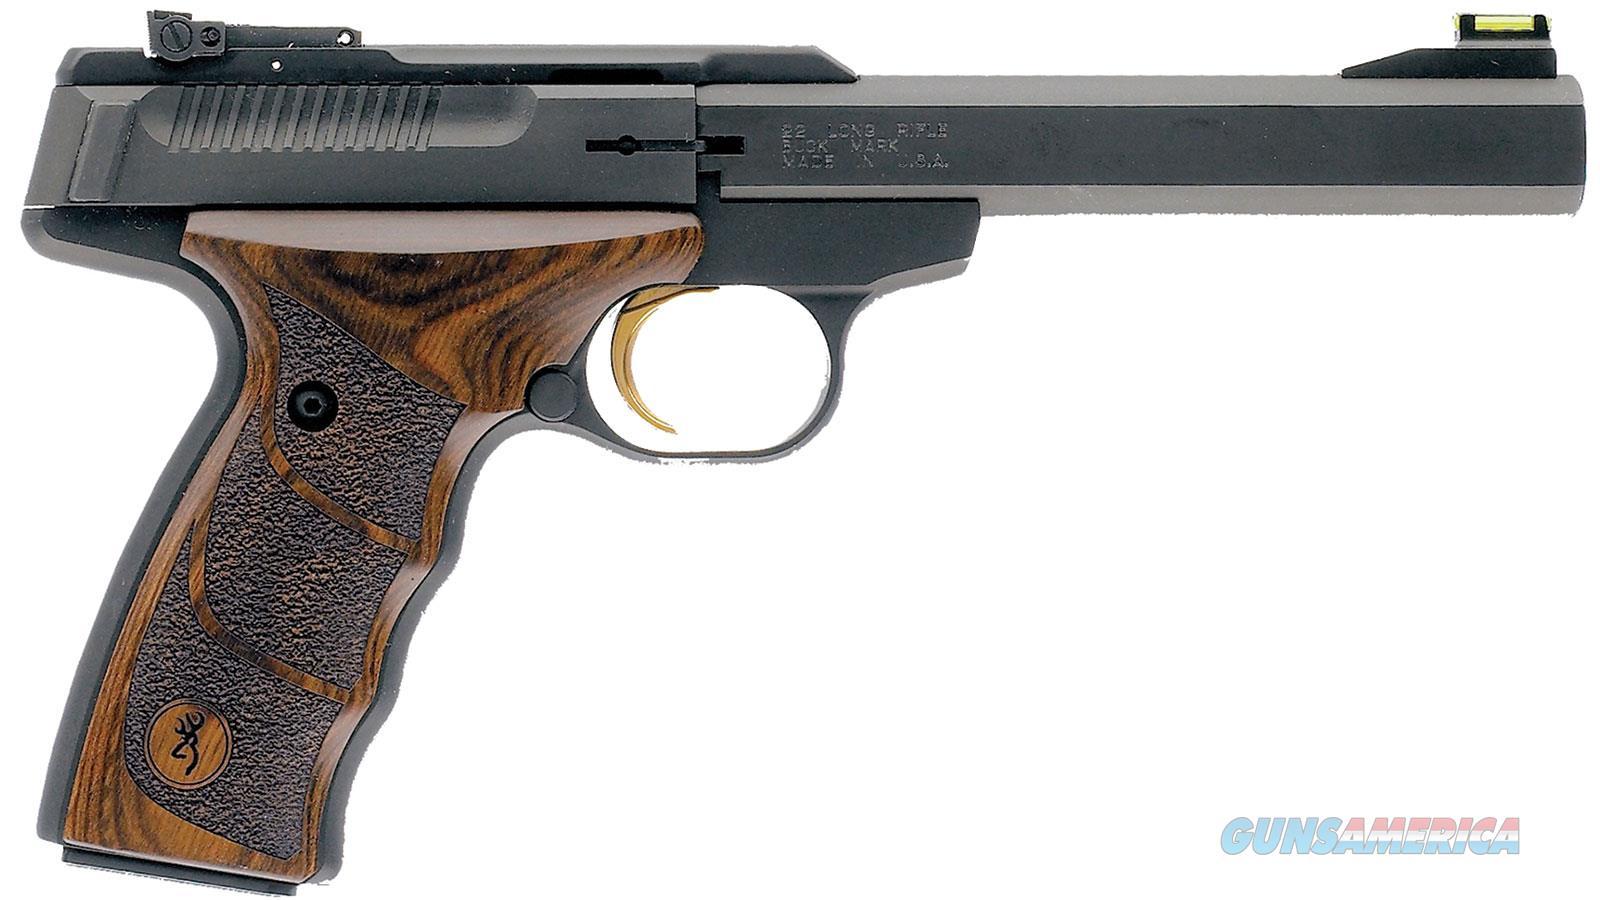 Browning Bkmk Pls Udx 22Lr 5.5 051428490  Guns > Pistols > B Misc Pistols